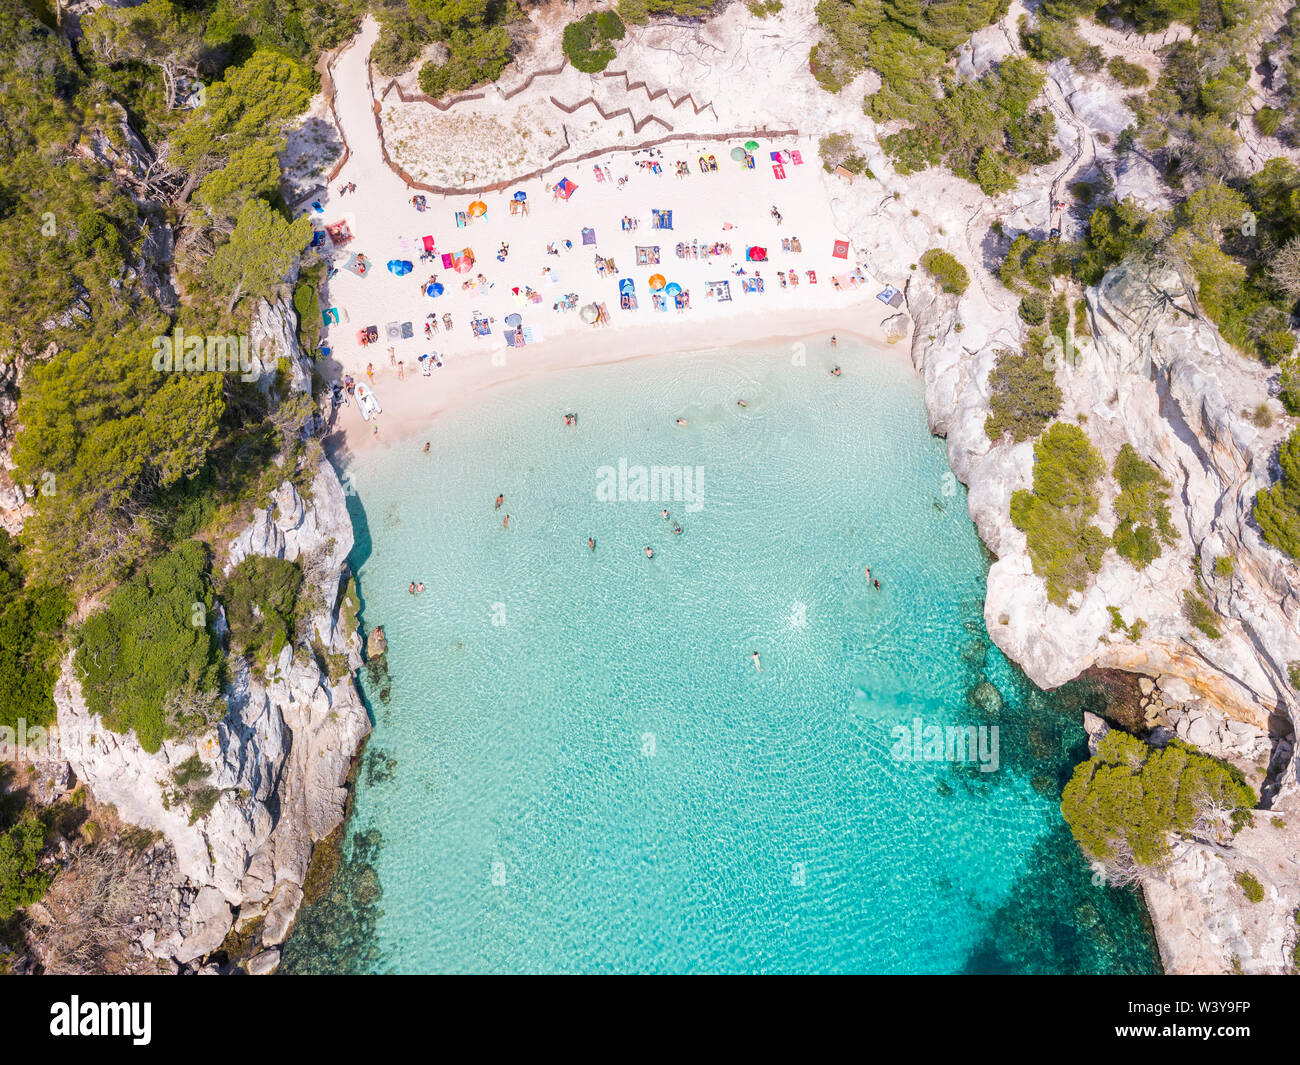 Aerial view of Cala Macarelleta beach crowded in summer, Menorca, Balearic Islands, Spain - Stock Image